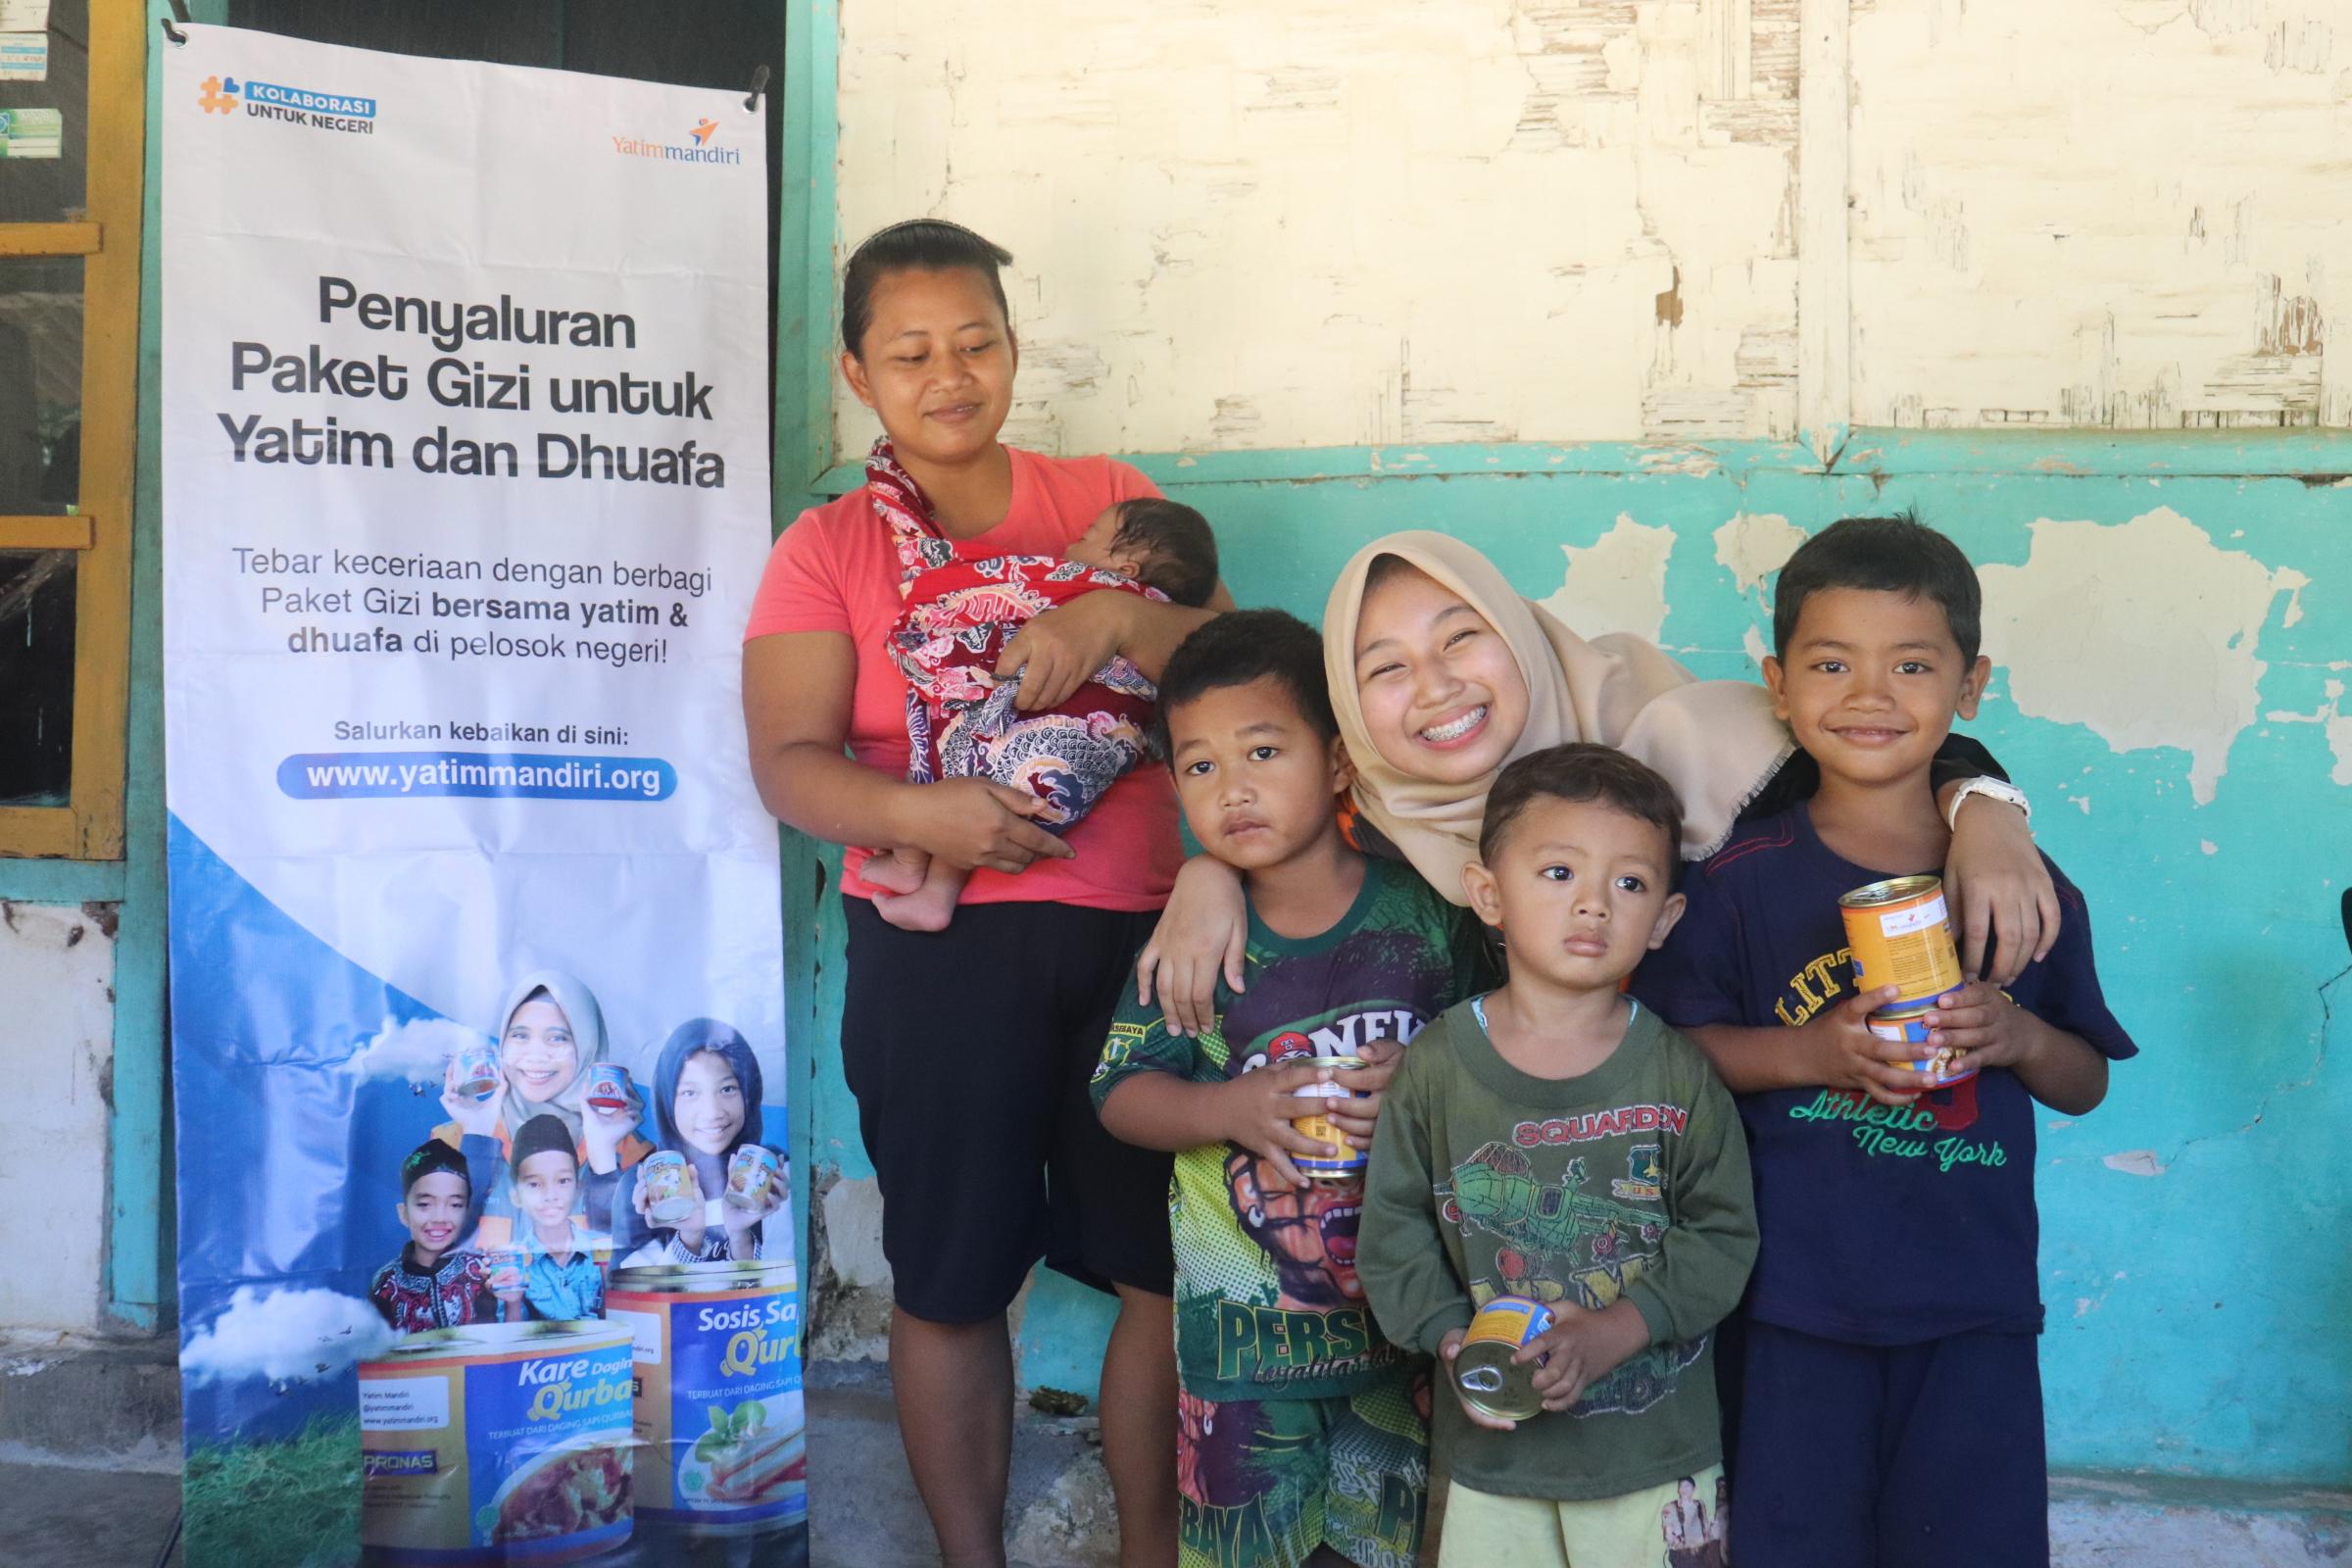 Penyaluran Paket Gizi untuk Yatim dan Dhuafa Pelosok Banyuwangi